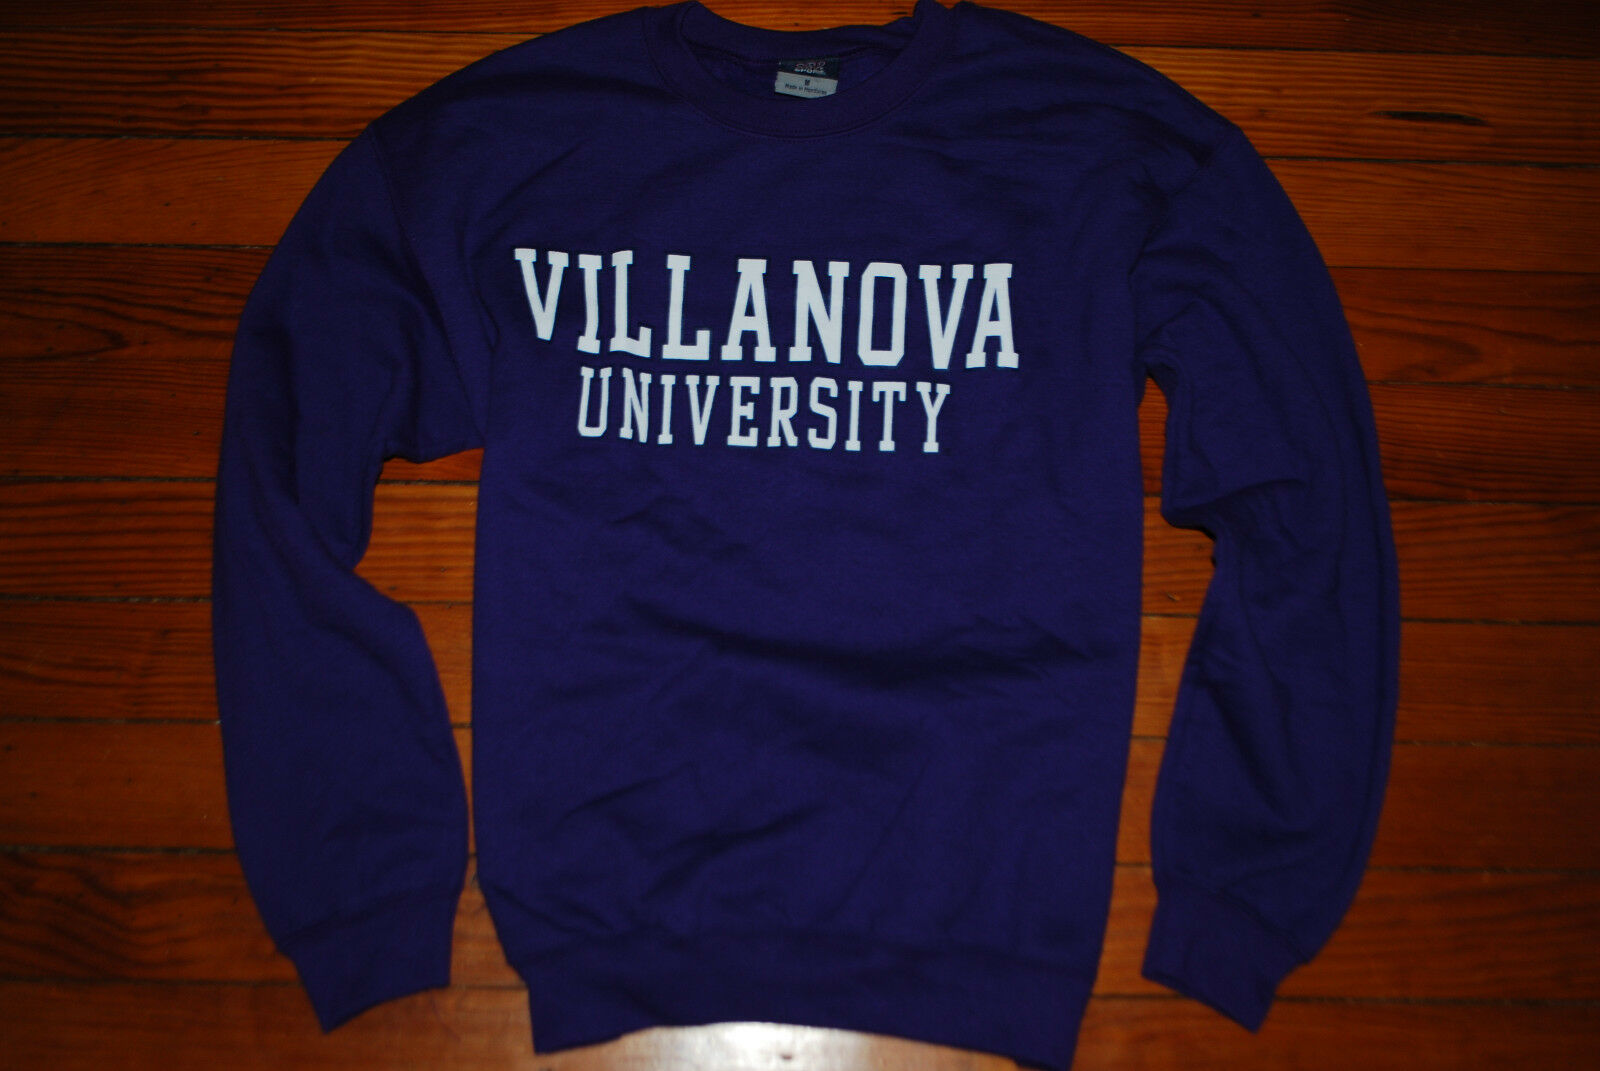 NEW Women's Villanova University Purple Oversized Sweatshirt (Small)